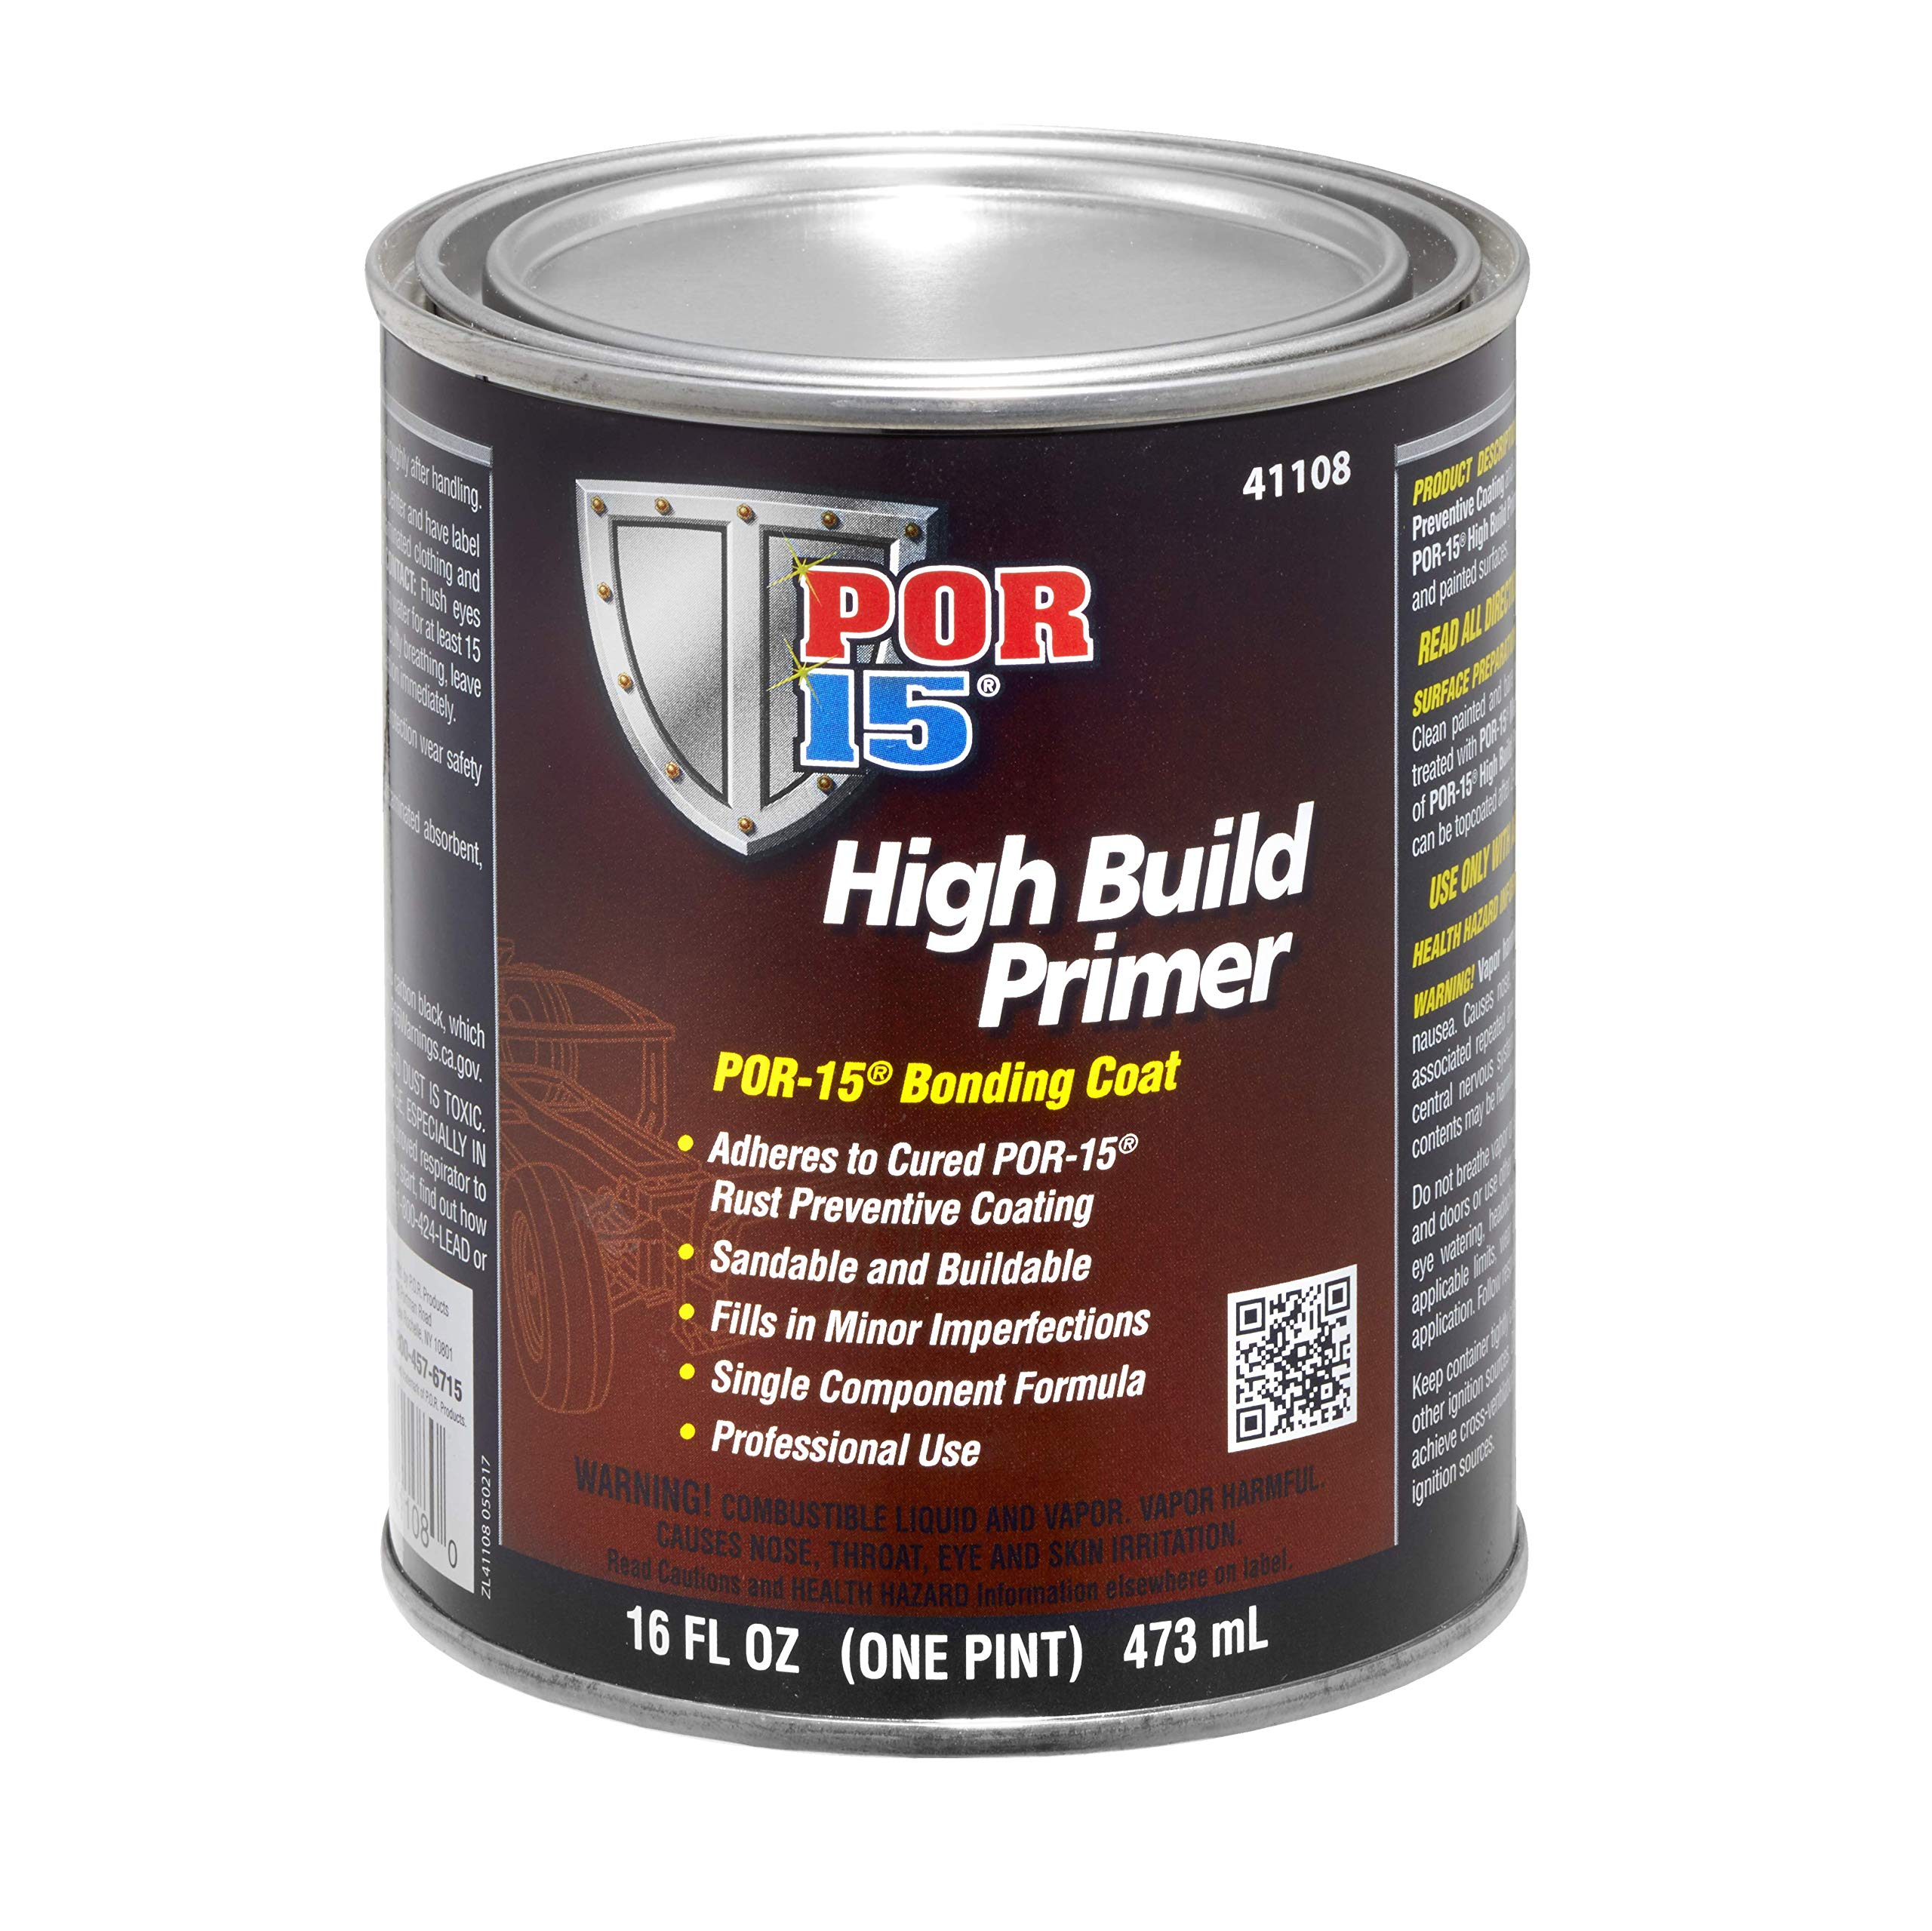 POR-15 41108 High Build Primer - 1 pint